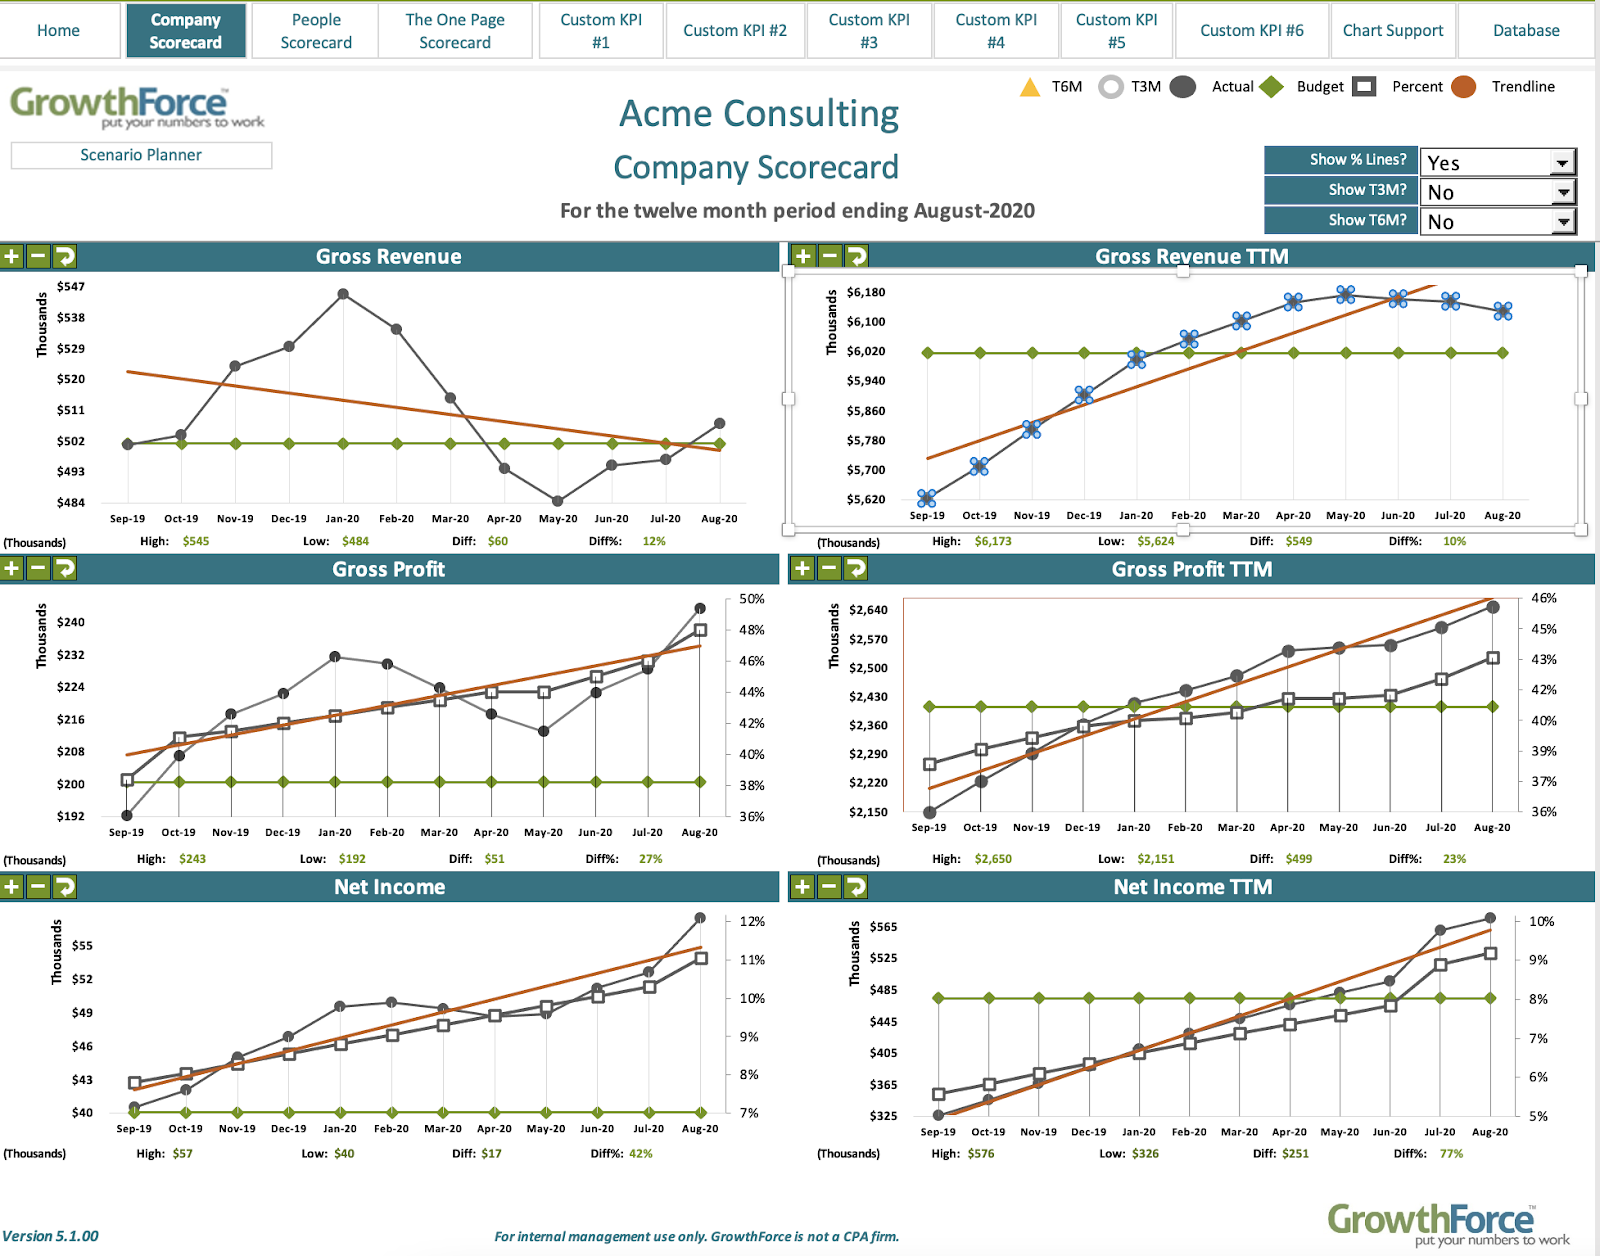 GrowthForce Company Scorecard